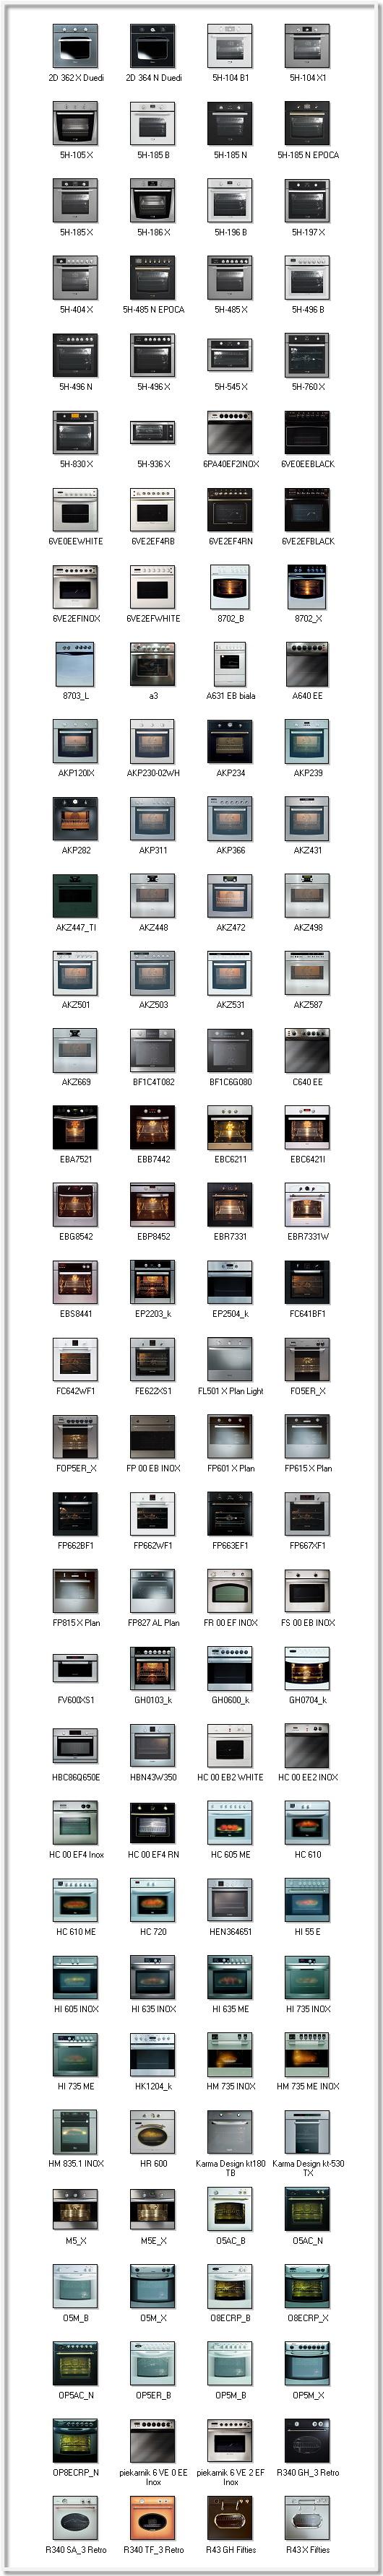 духовки